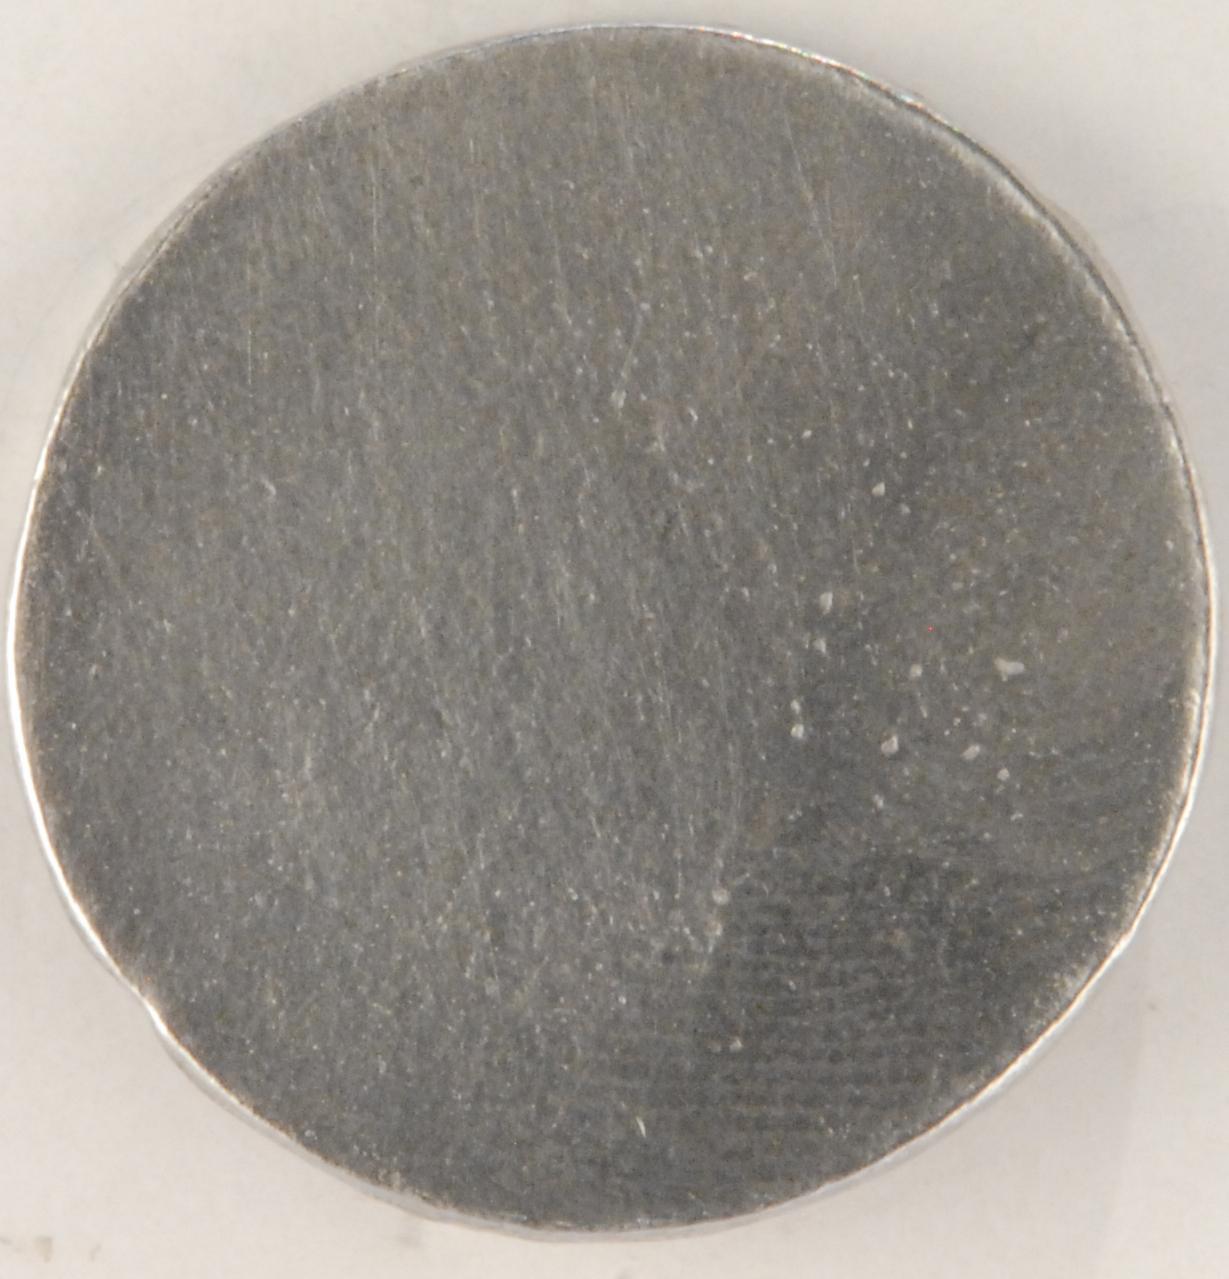 129 L pewter button